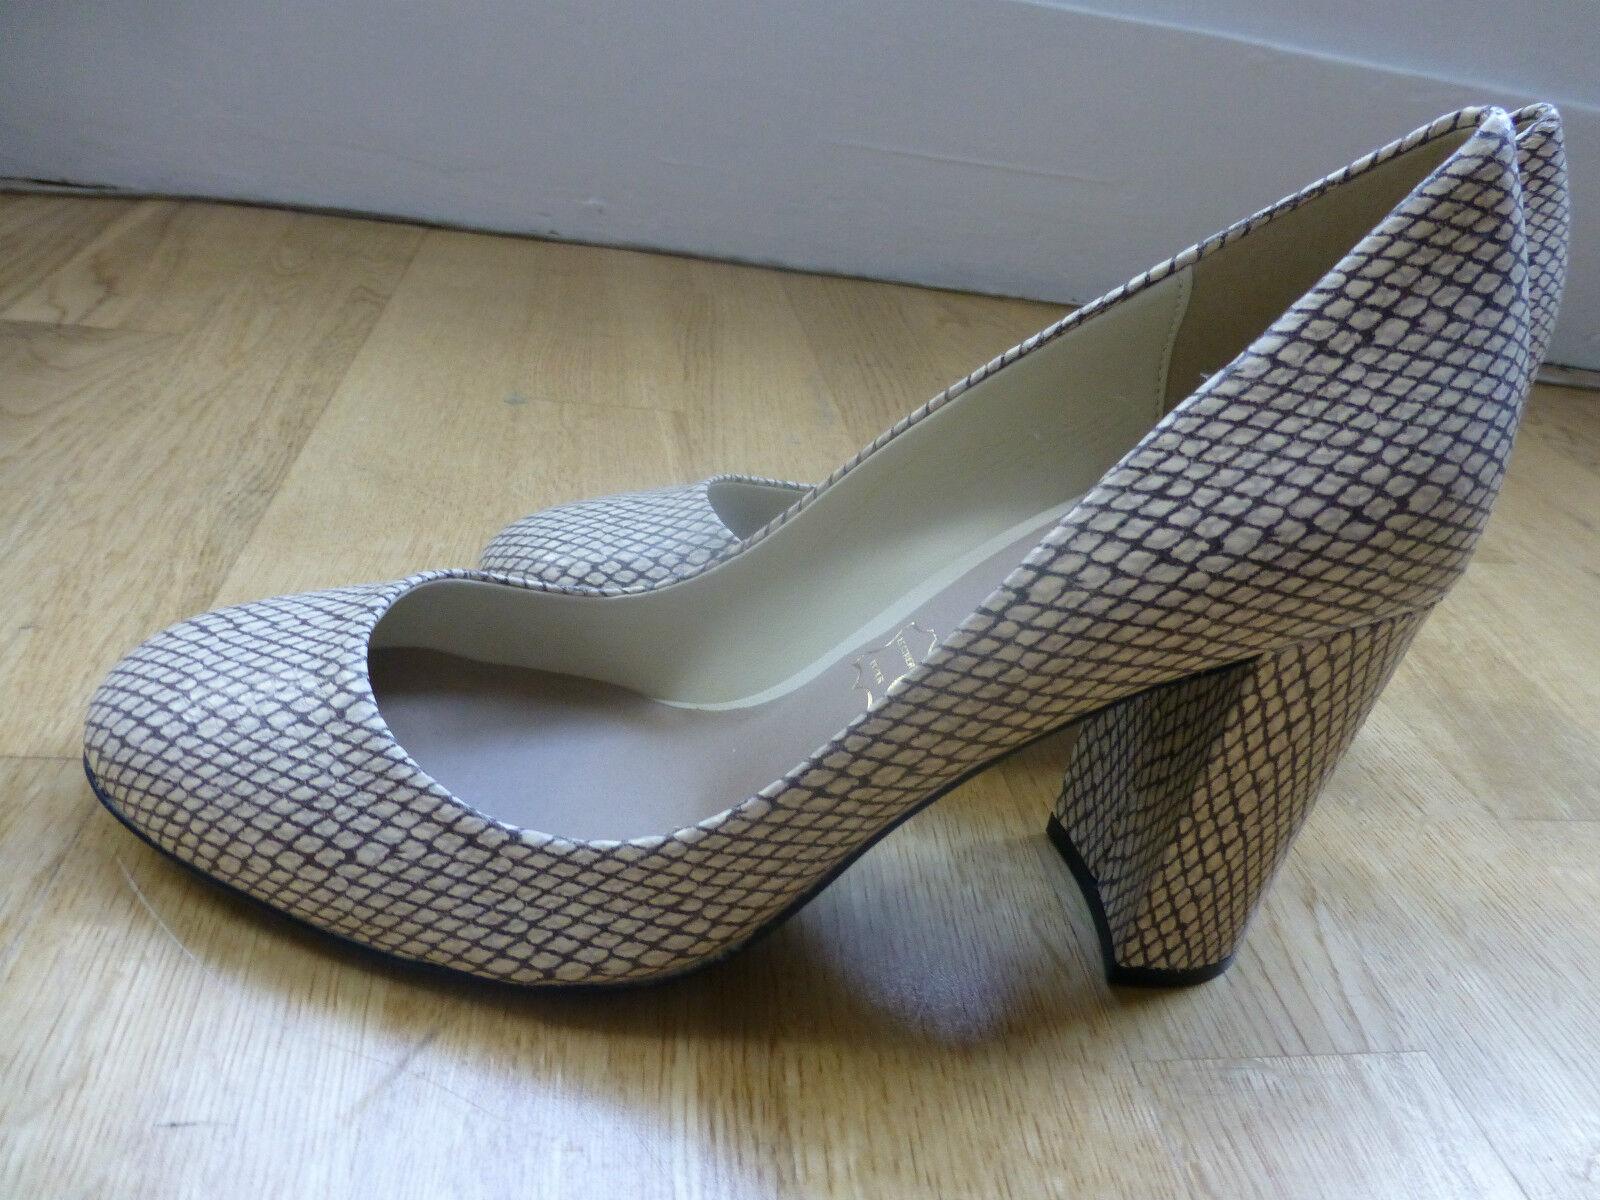 M&S Autograph Leather Faux Snakeskin Print Block Heel Court shoes Size 6 NEW